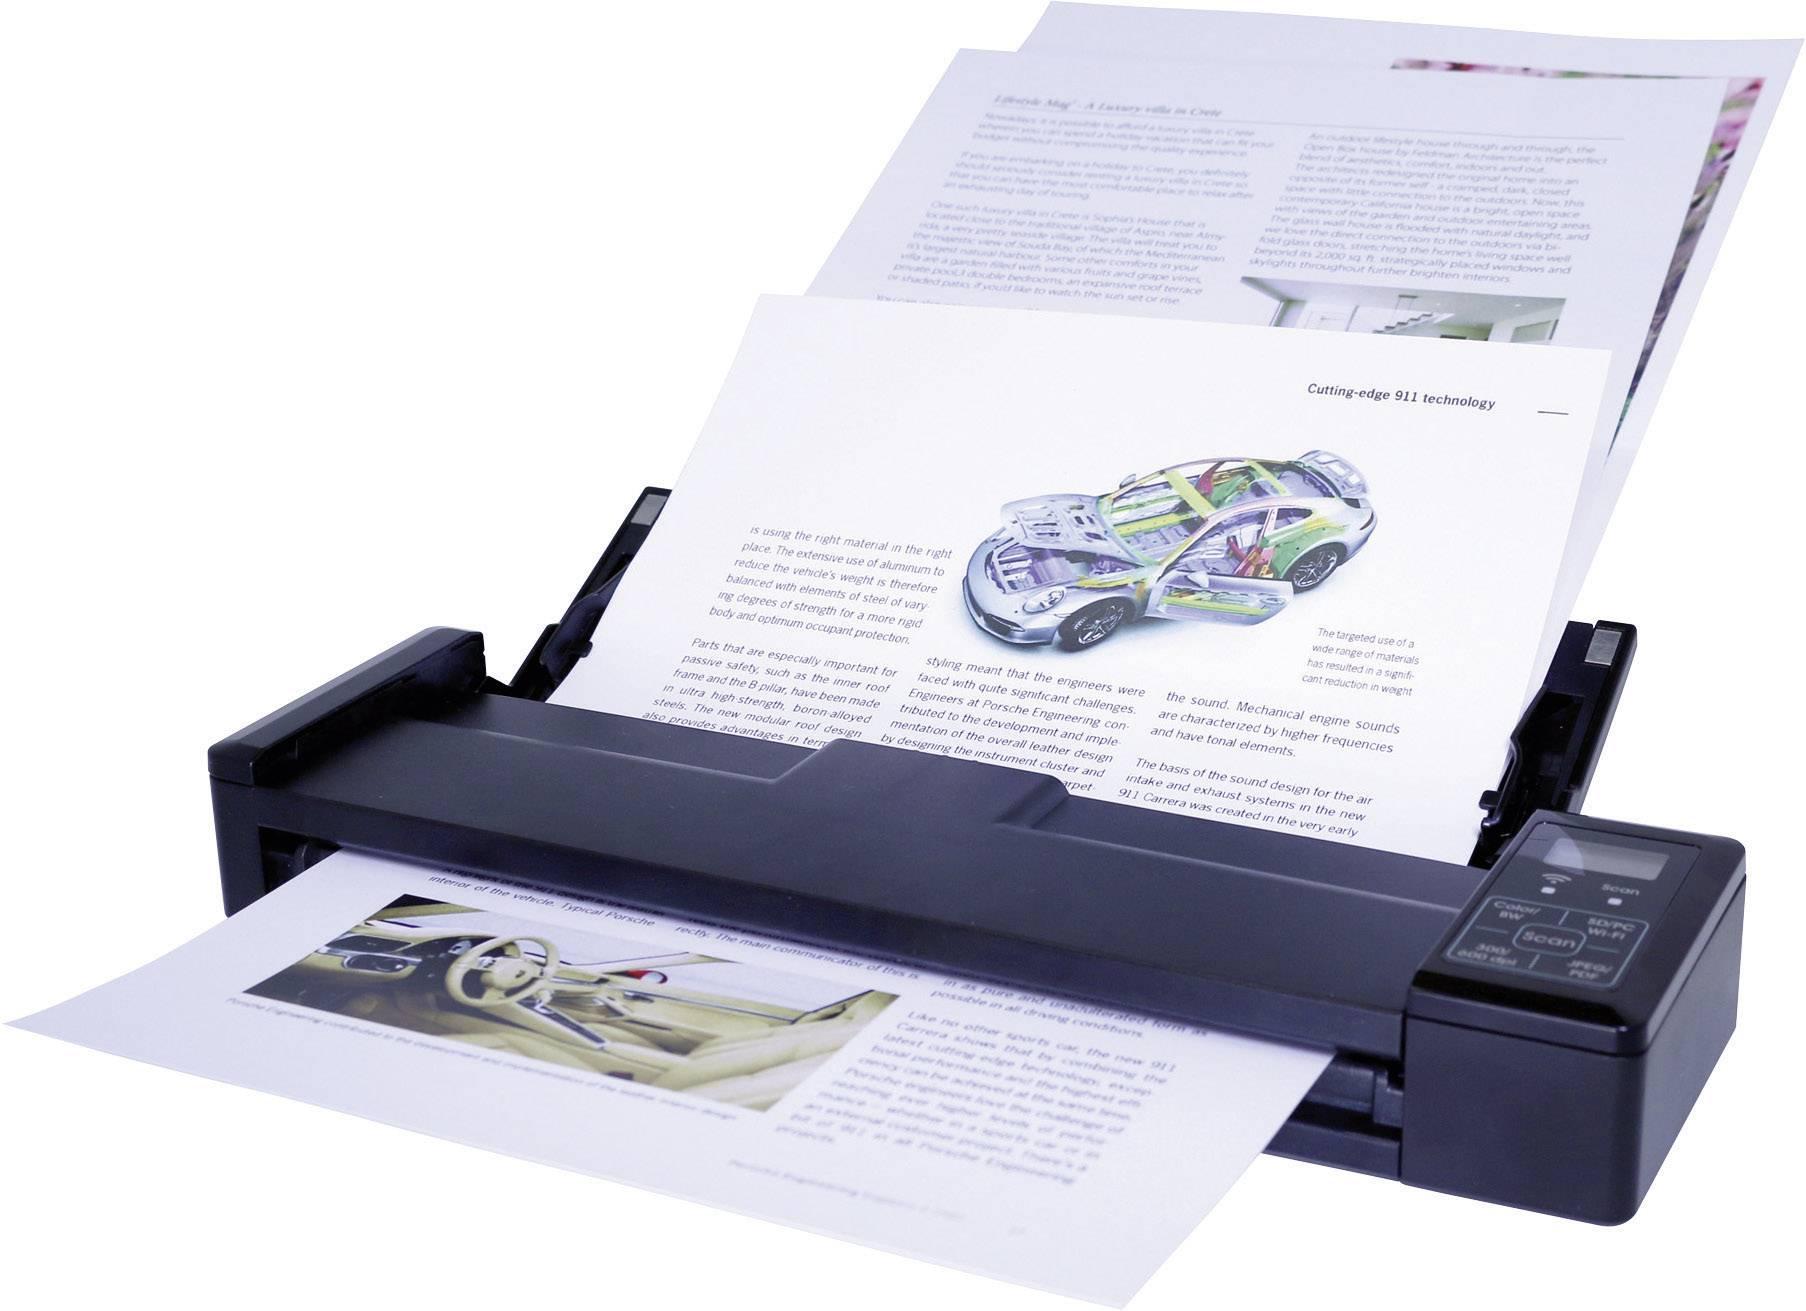 Iris By Canon Iriscan Pro 3 Wifi Dokumentenscanner A4 300 X 300 Dpi 8 Seiten Min Usb Wlan 802 11 B G N Microsd Micr